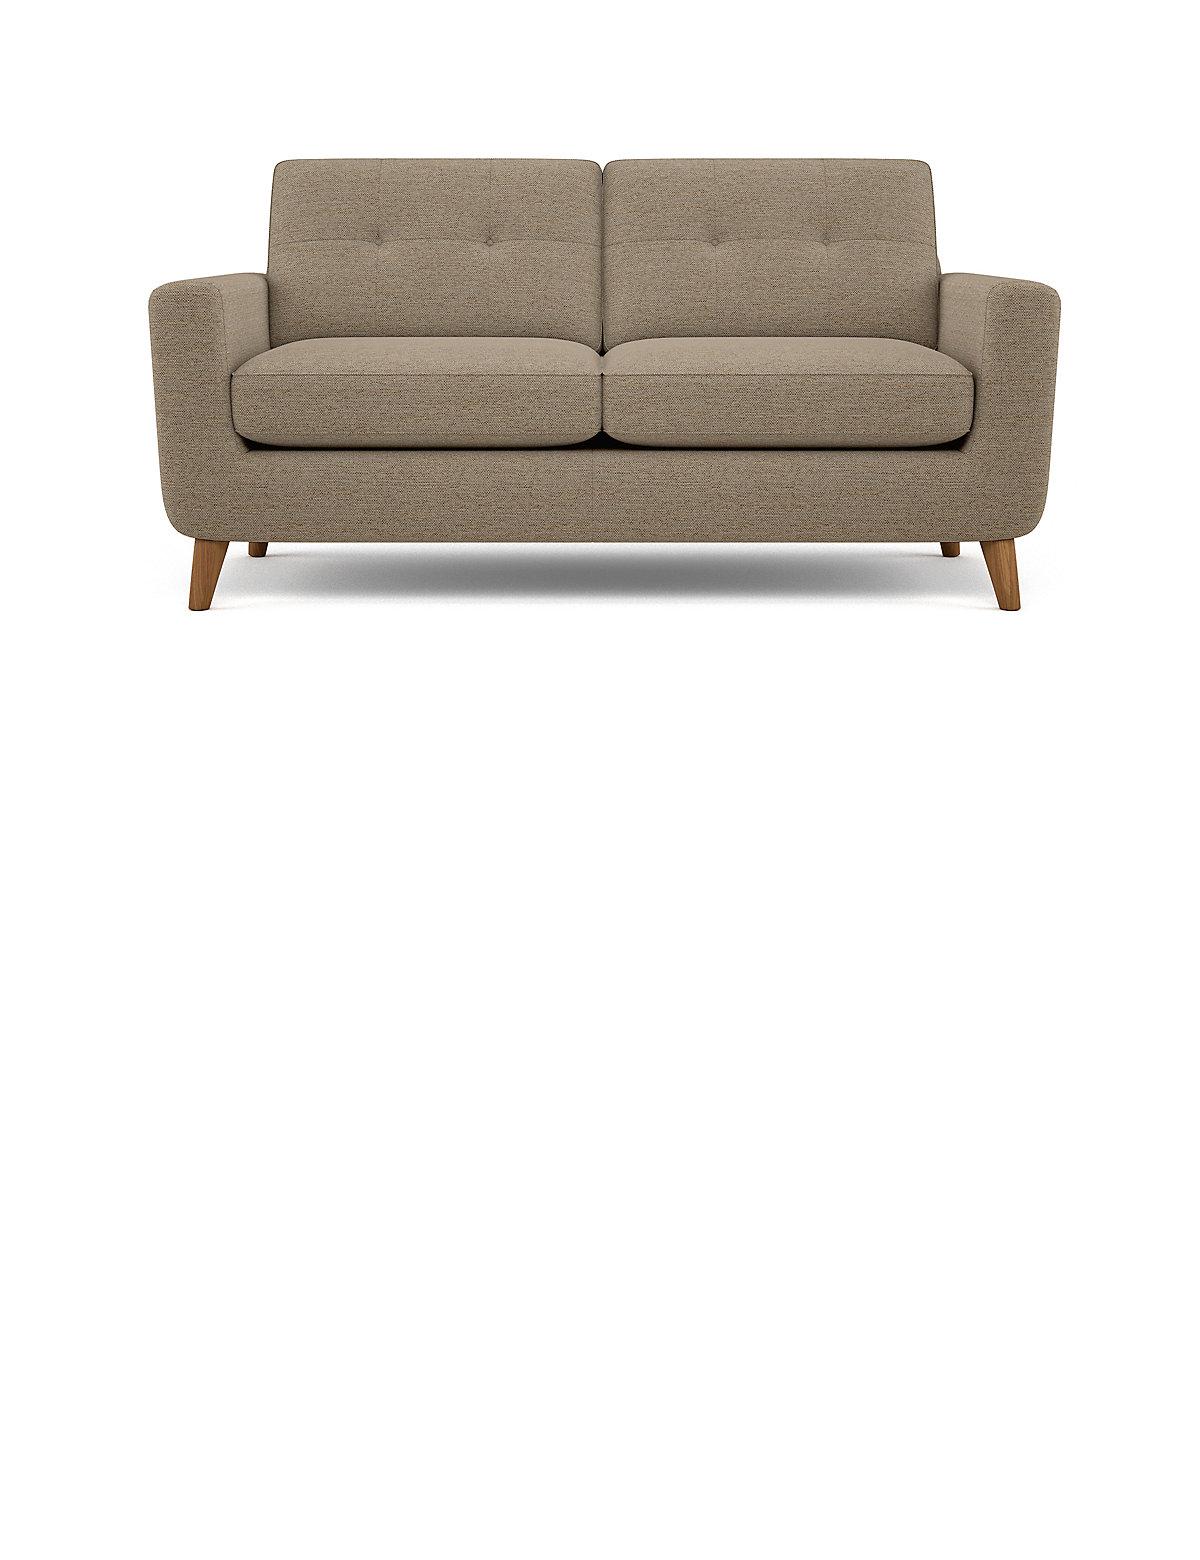 Conran Needham Medium Sofa